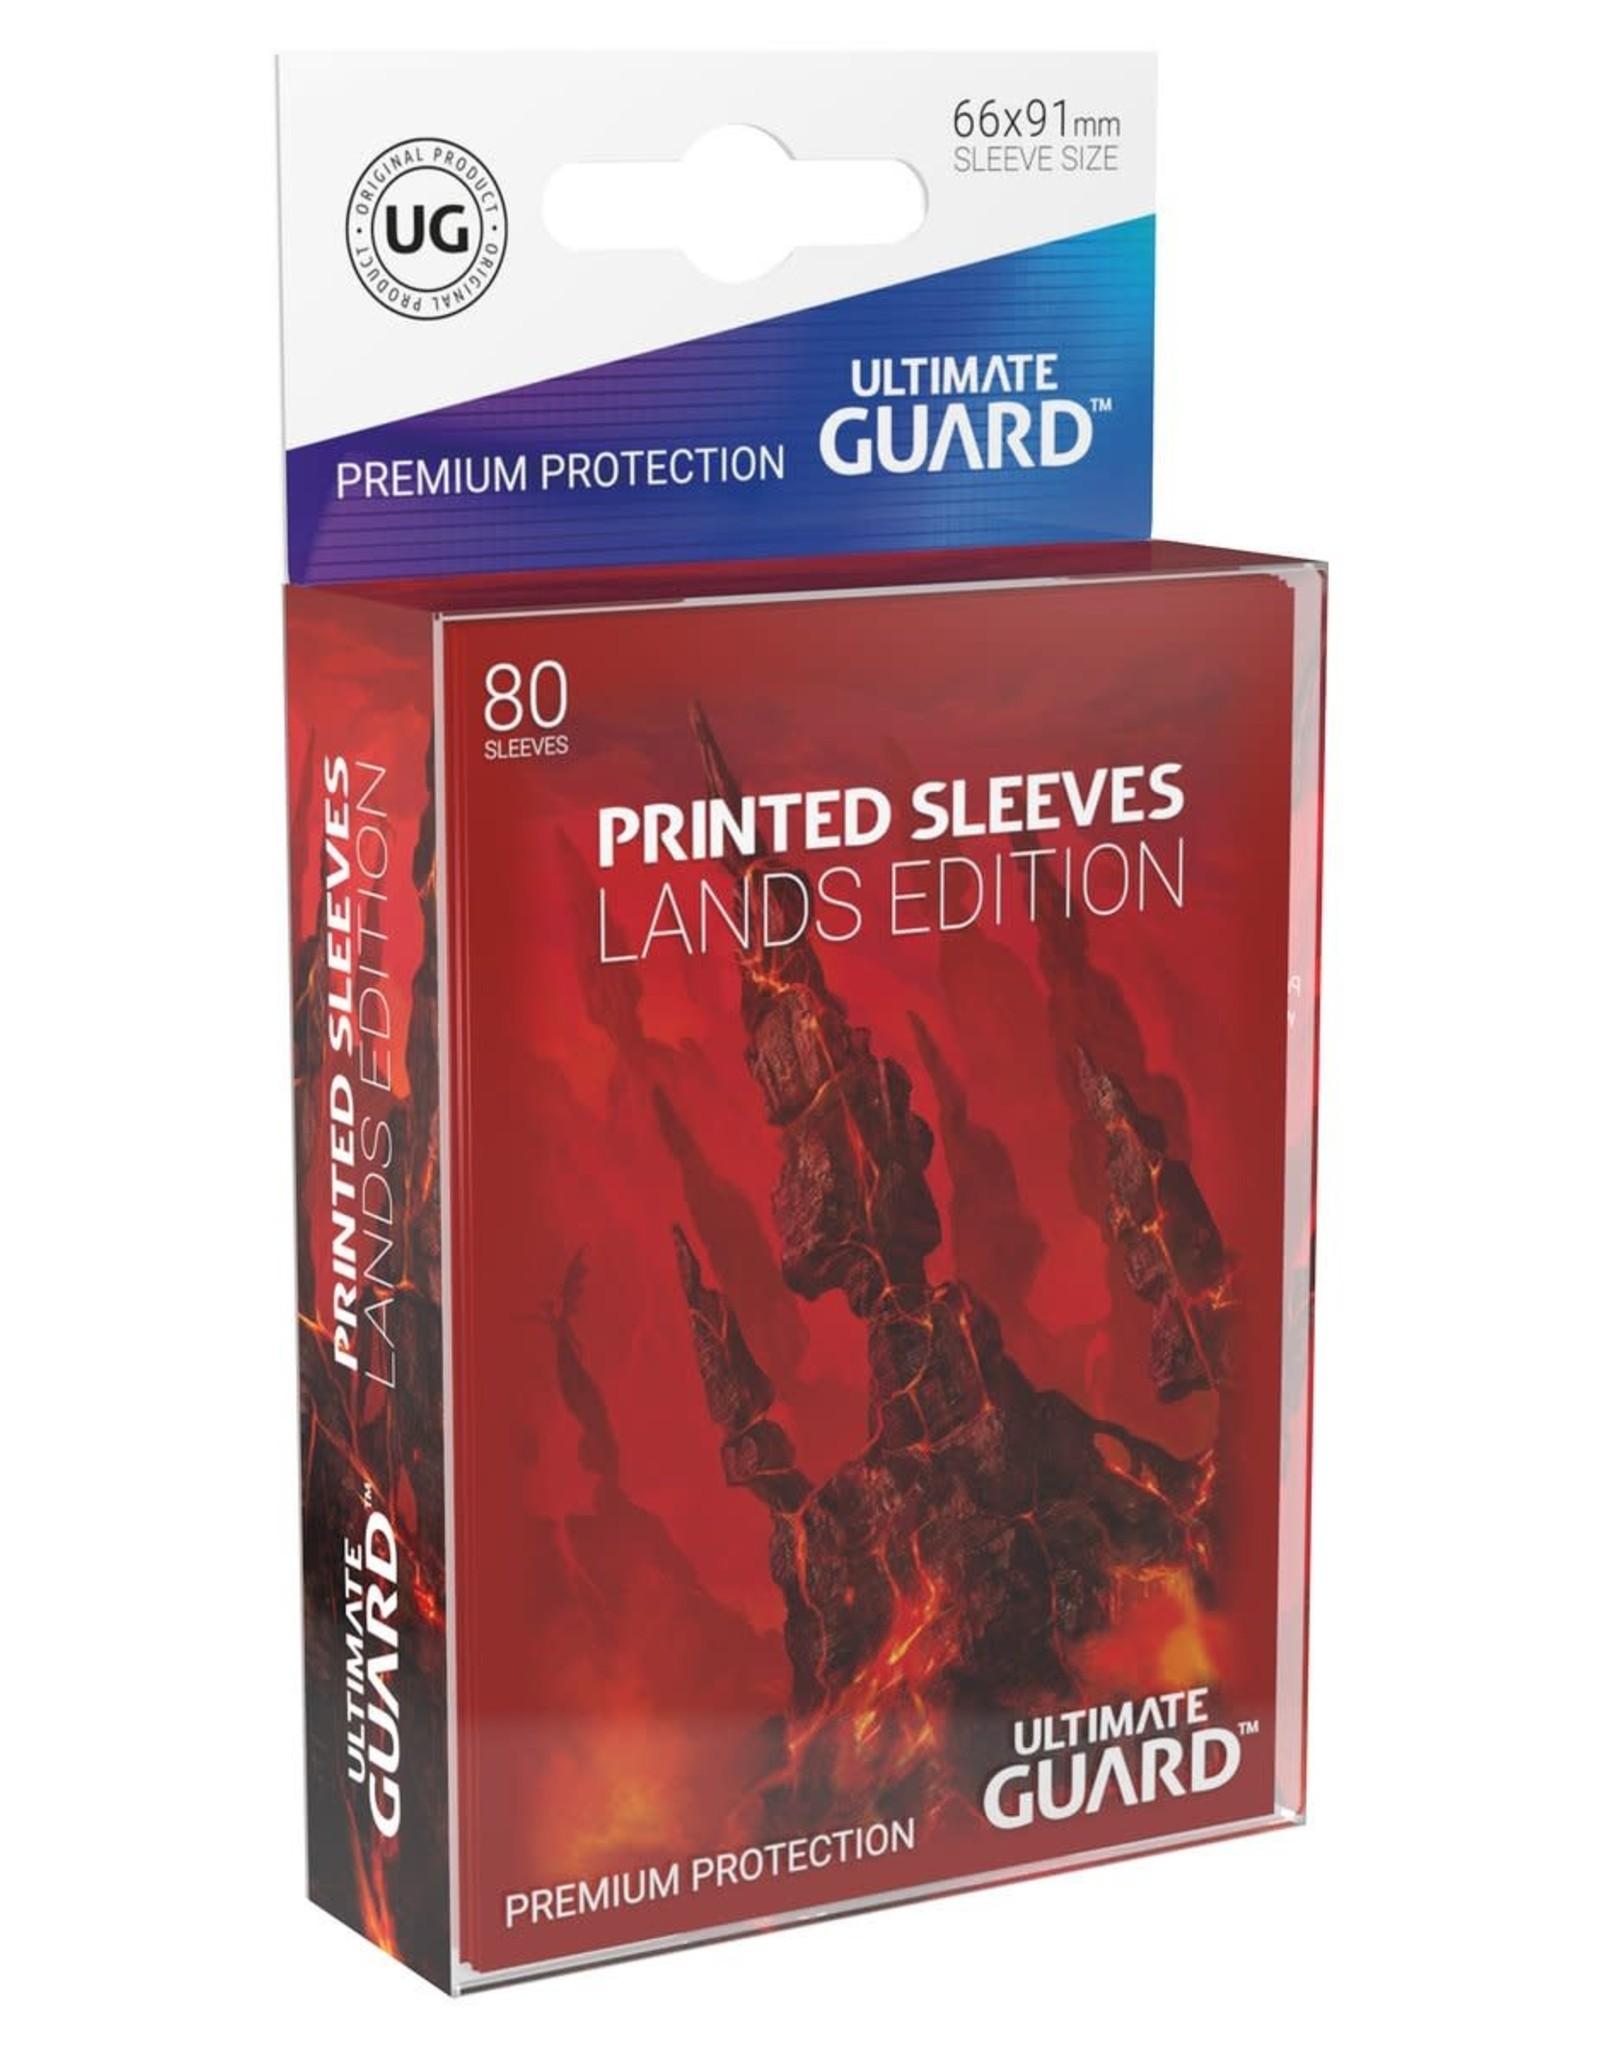 Ultimate Guard Printed Sleeves Std Lands Mountain